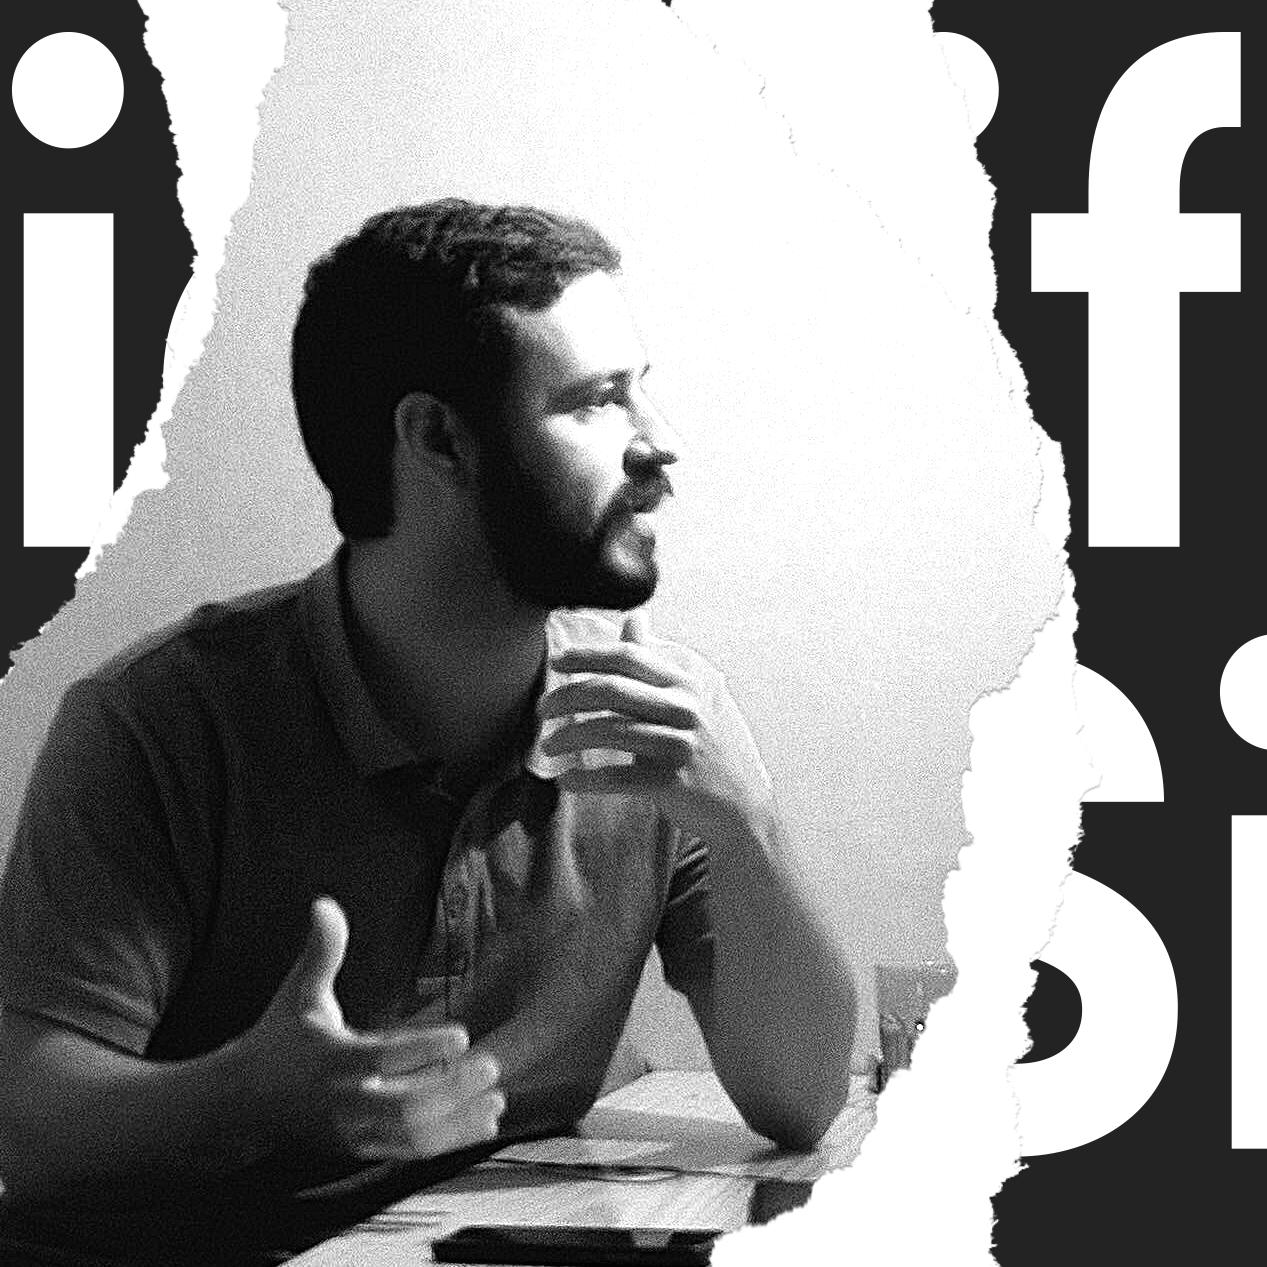 Picture of Pedro Brandão, founder of Significa.